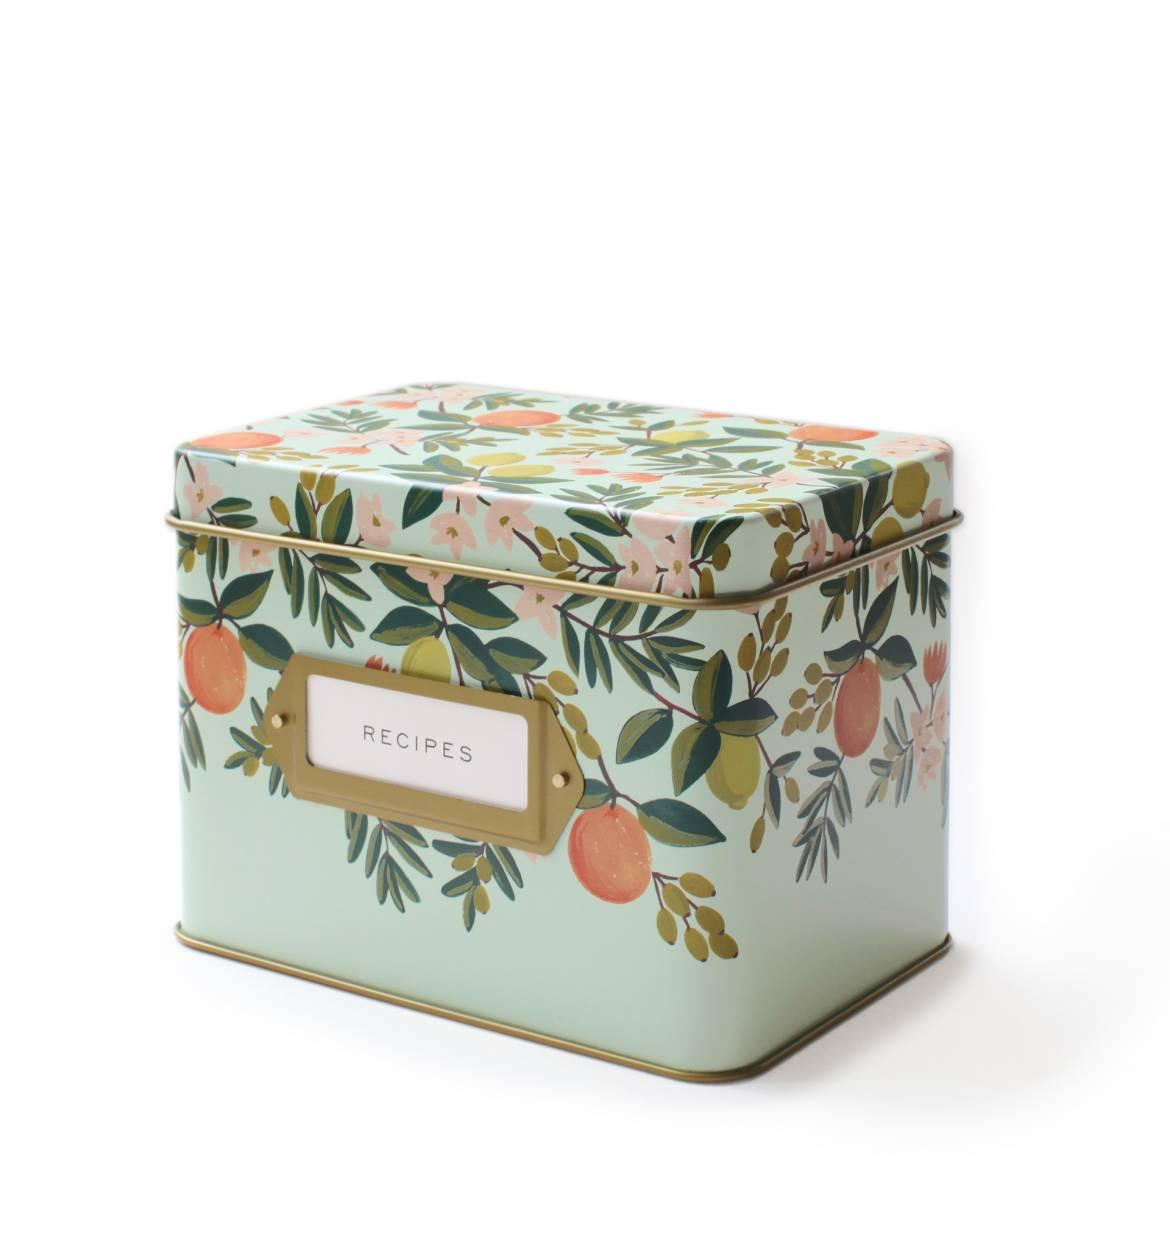 citrus-floral-kitchen-recipe-box-01_4.jpg